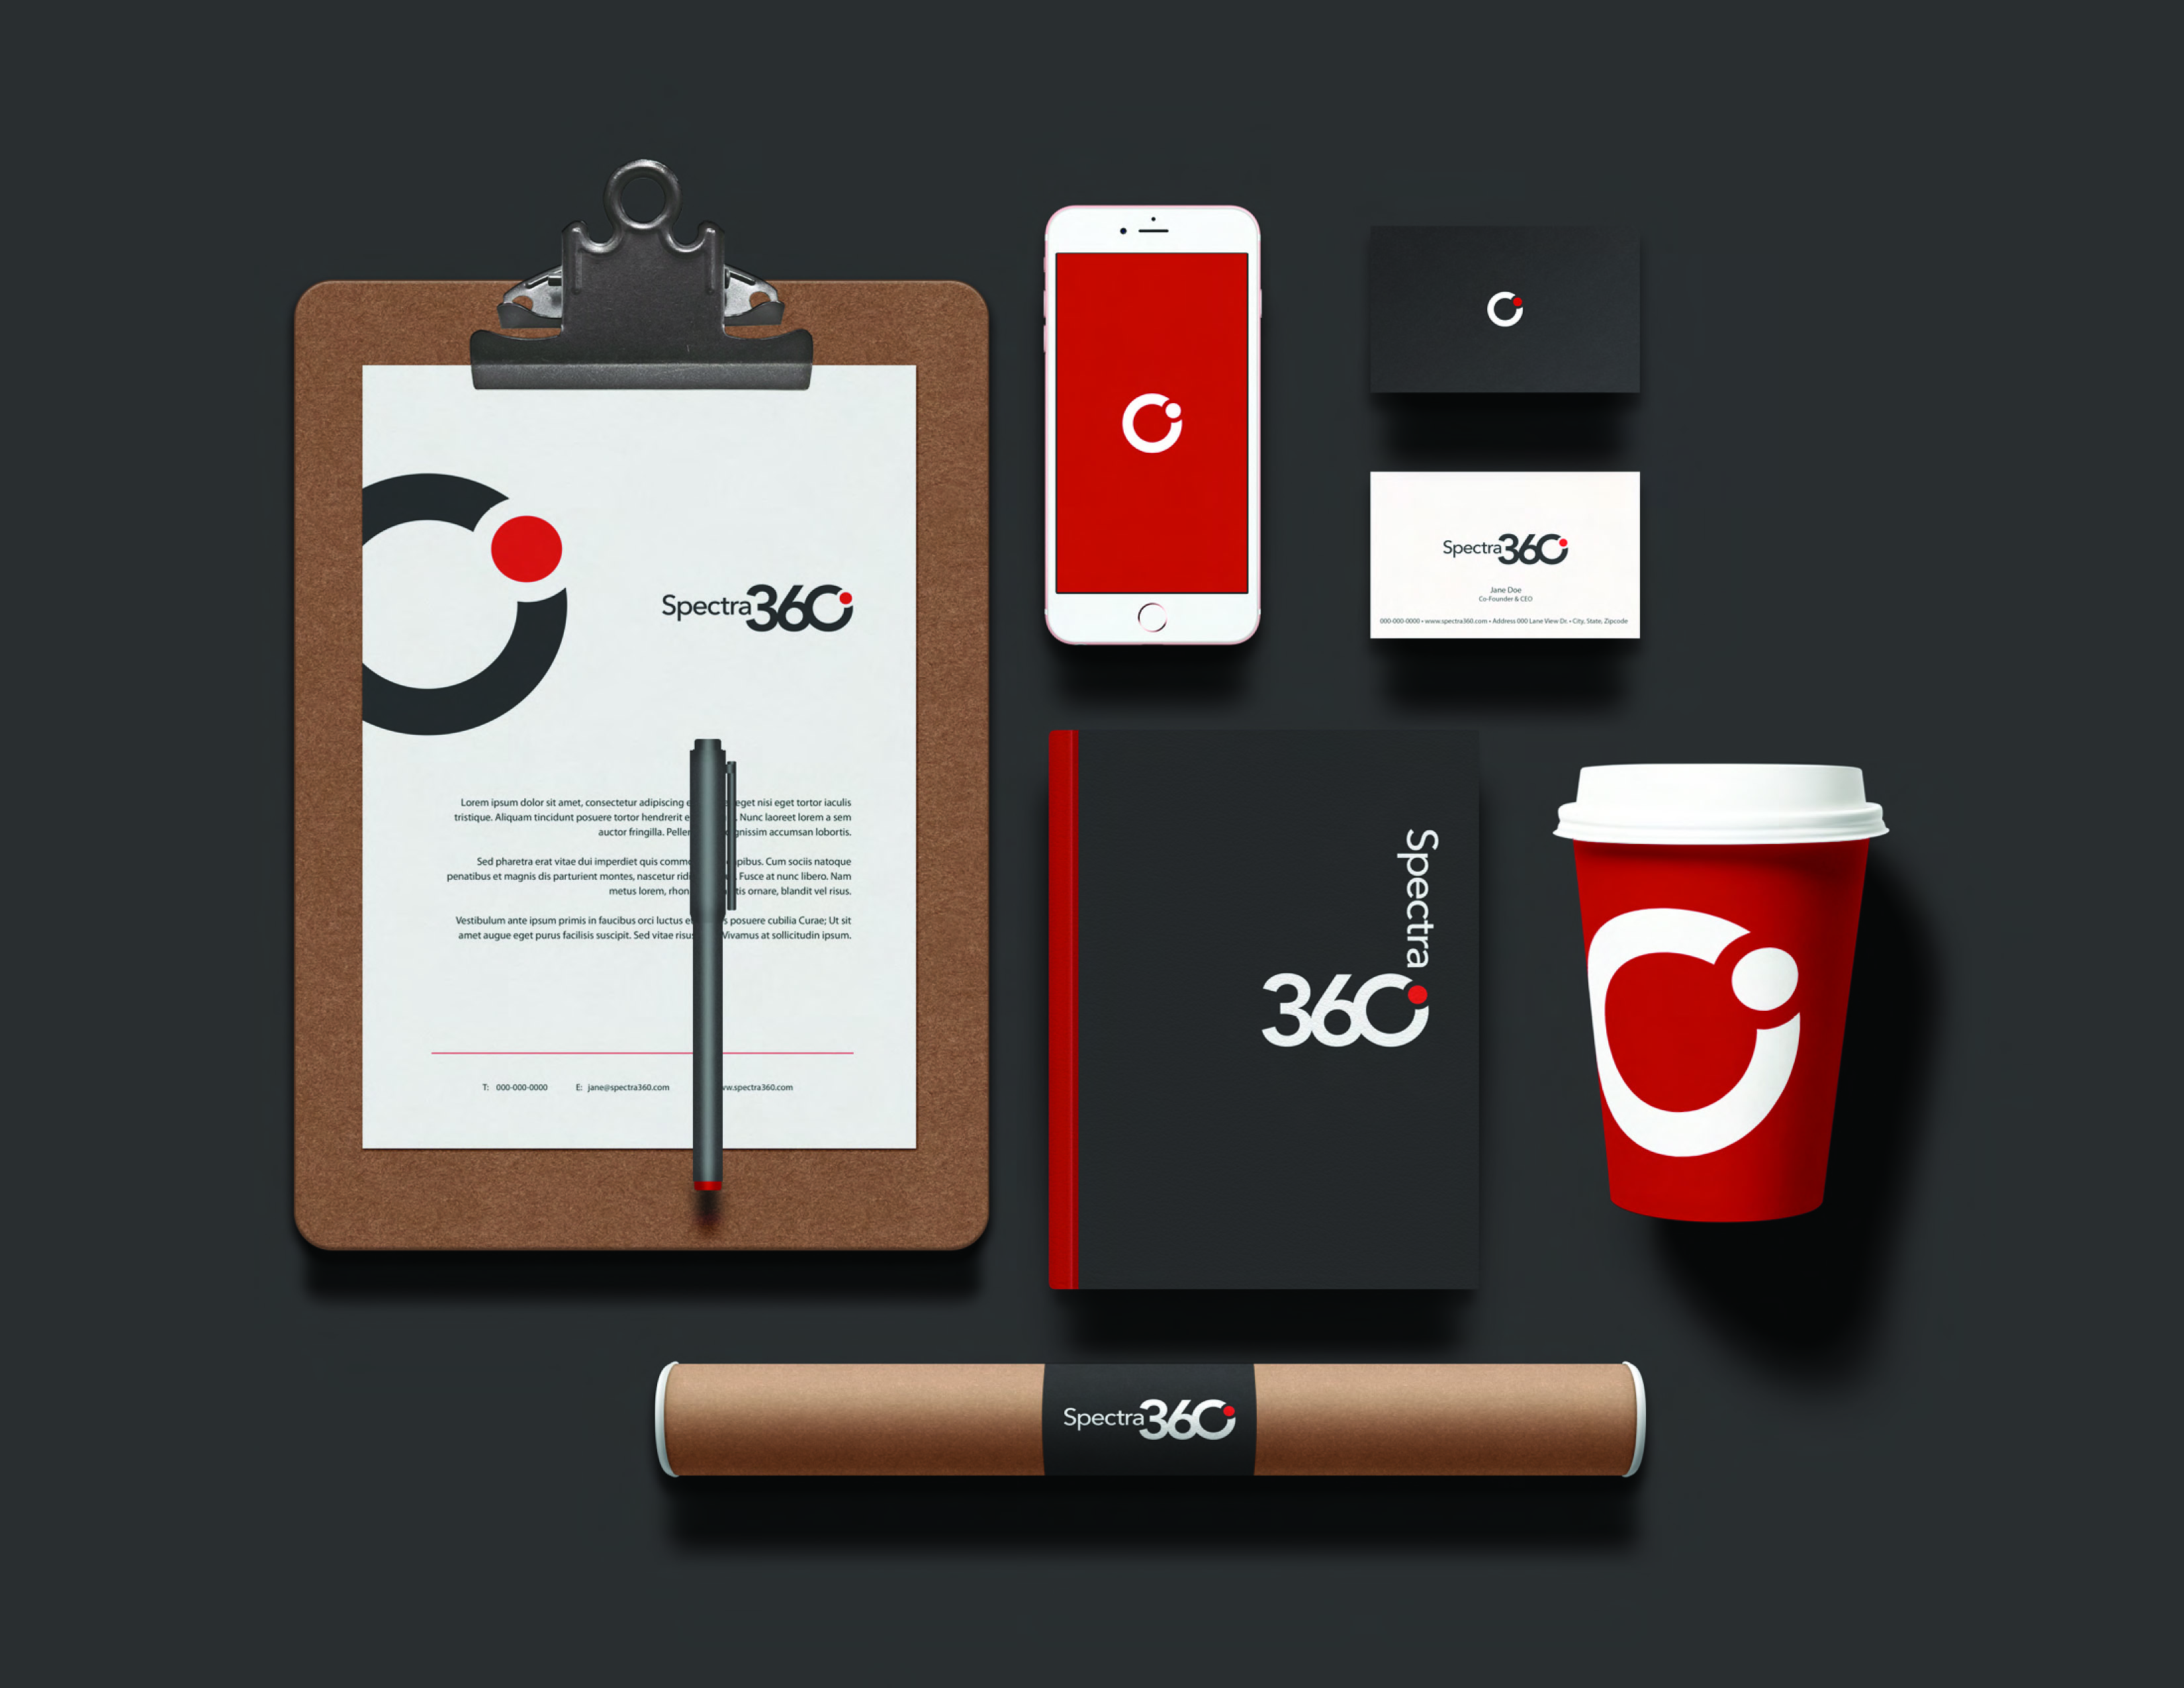 Spectra360 Branding